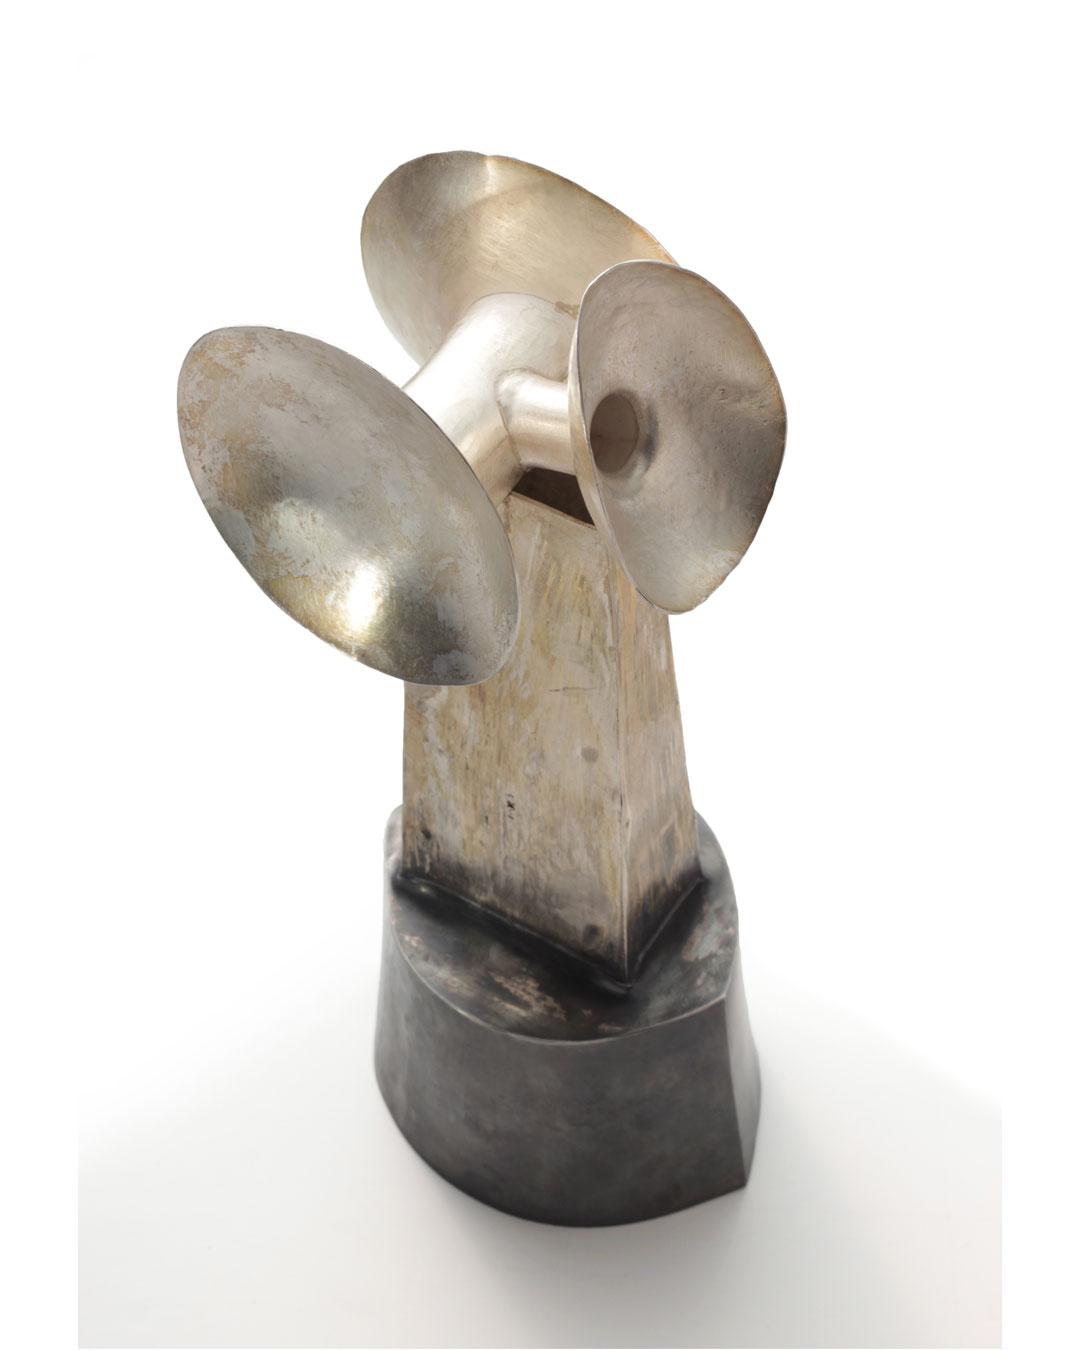 Rudolf Kocéa, Ausgezeichnet (Distinguished), 2014, object; silver, copper, 300 x 130 x 100 mm, €7750